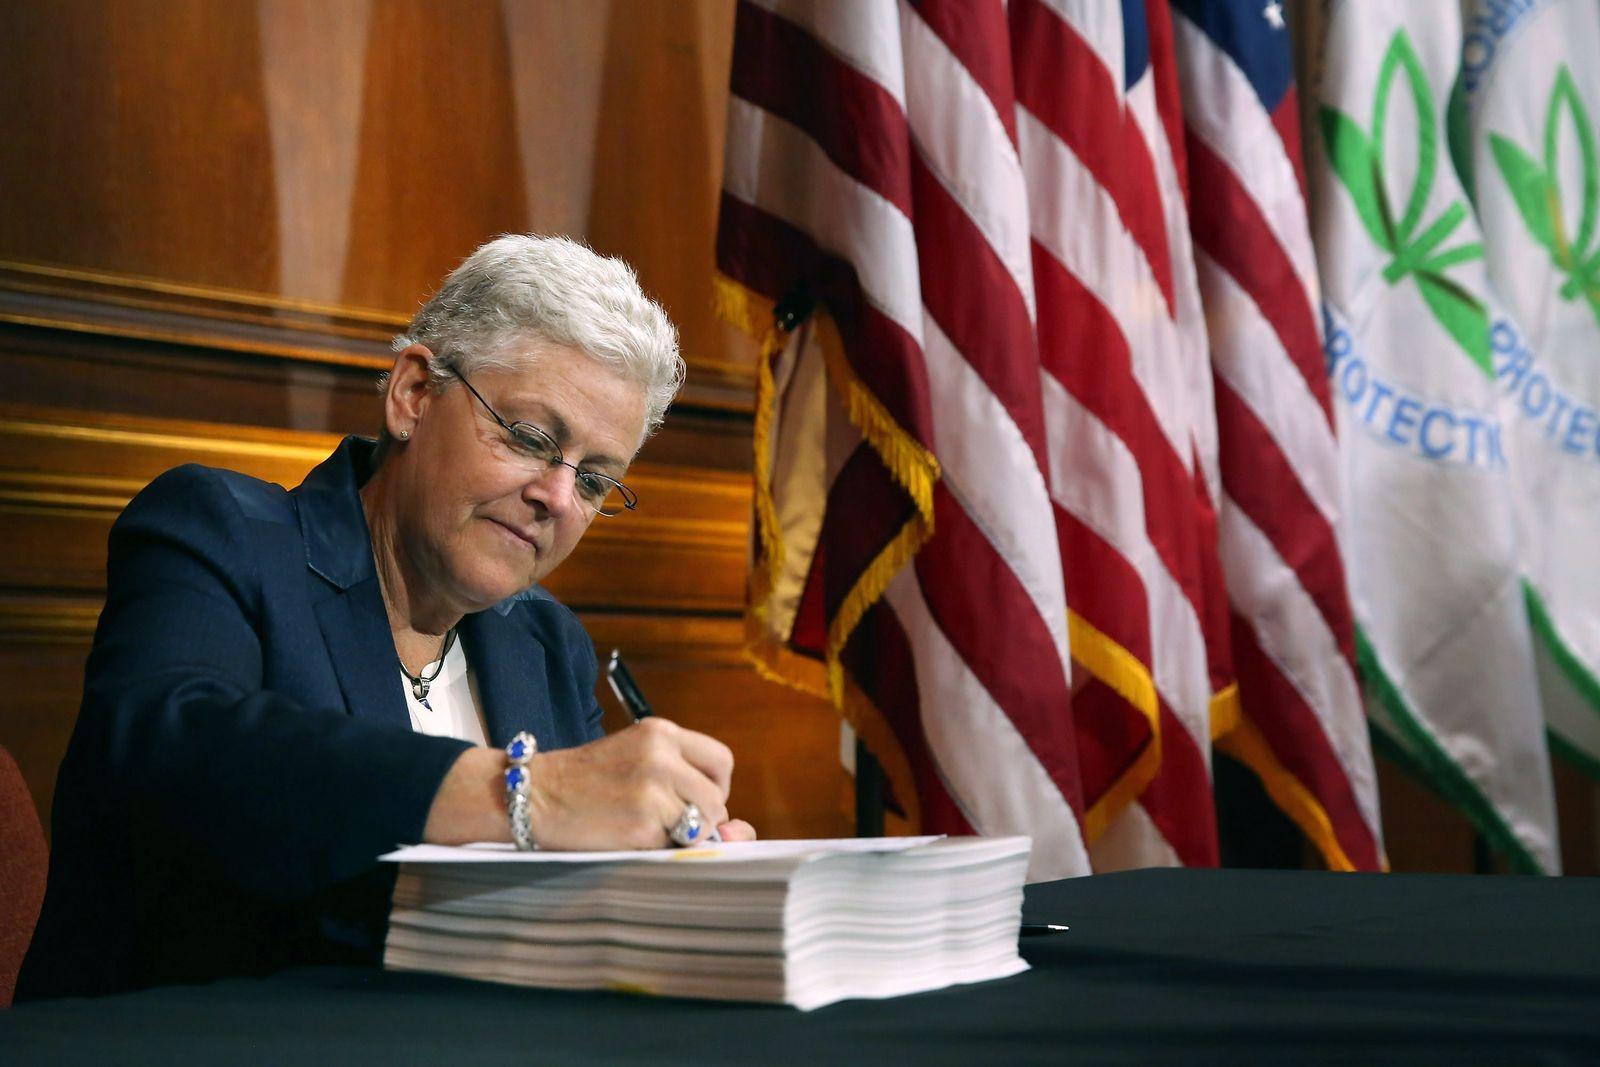 US-EPA-ADMIN-GINA-MCCARTHY-ANNOUNCES-NEW-REGULATIONS-UNDER-OBAMA